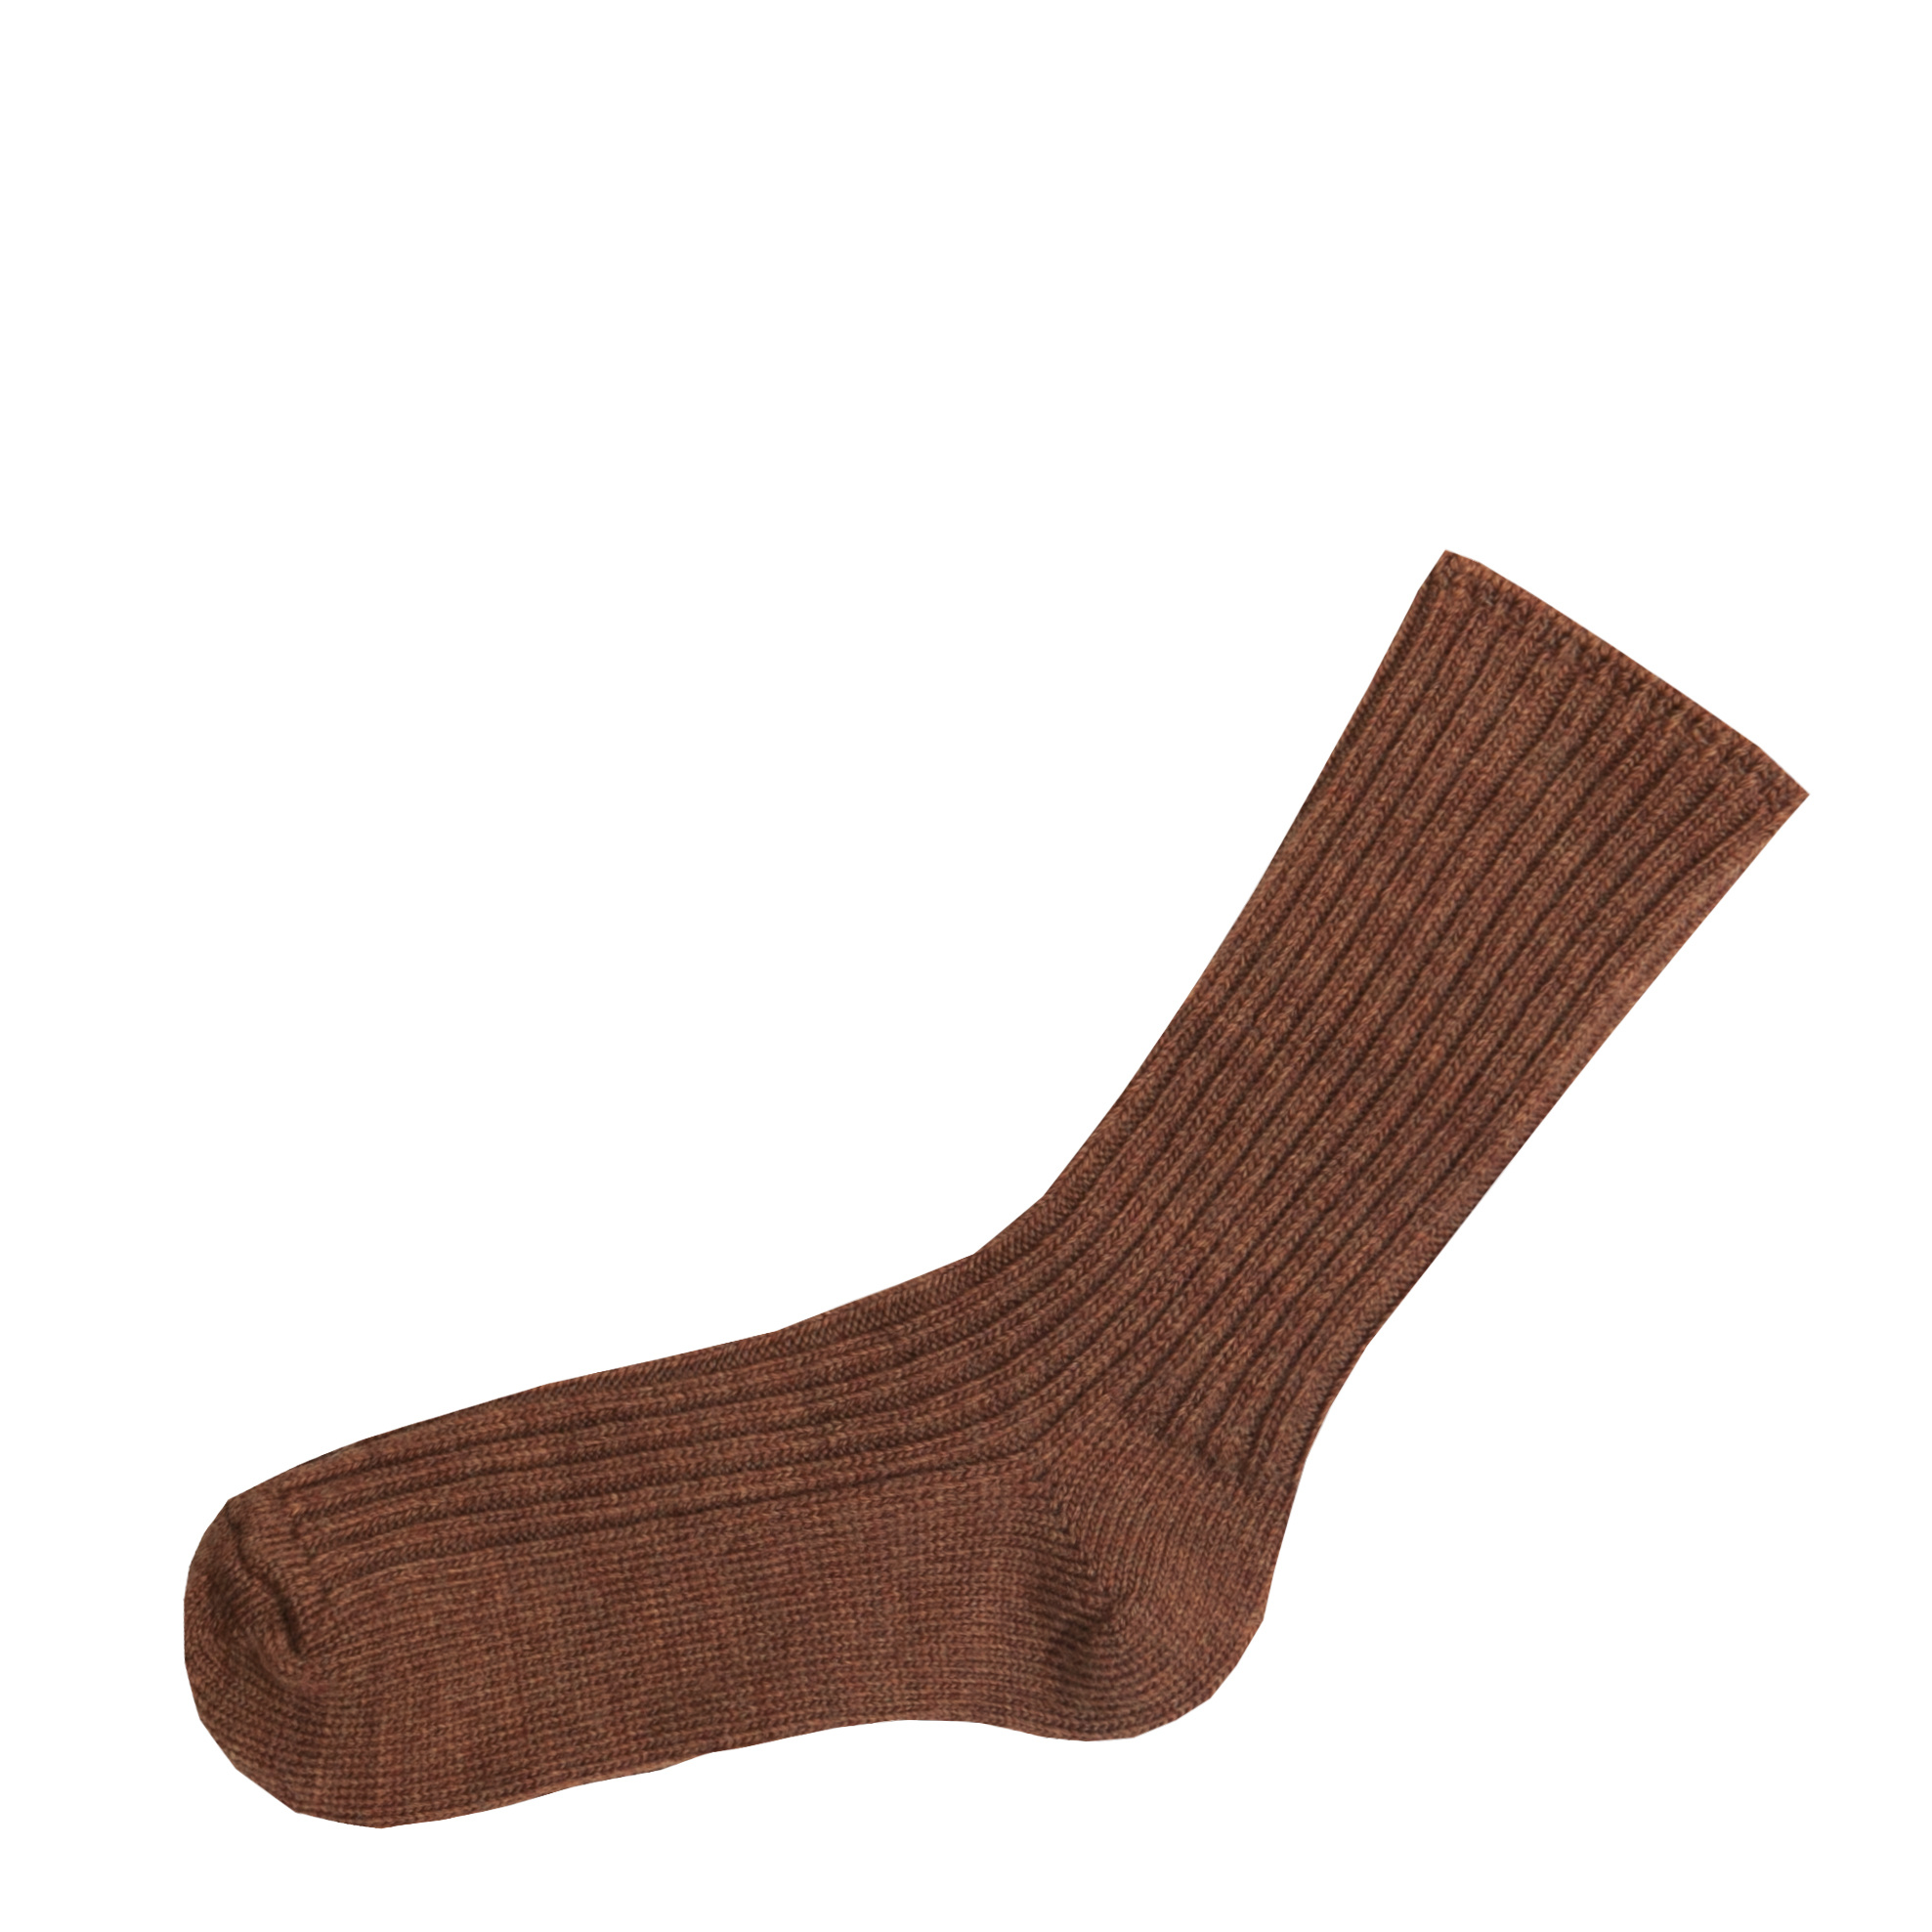 Joha Joha Wollen sokken - Koper melange (60014)